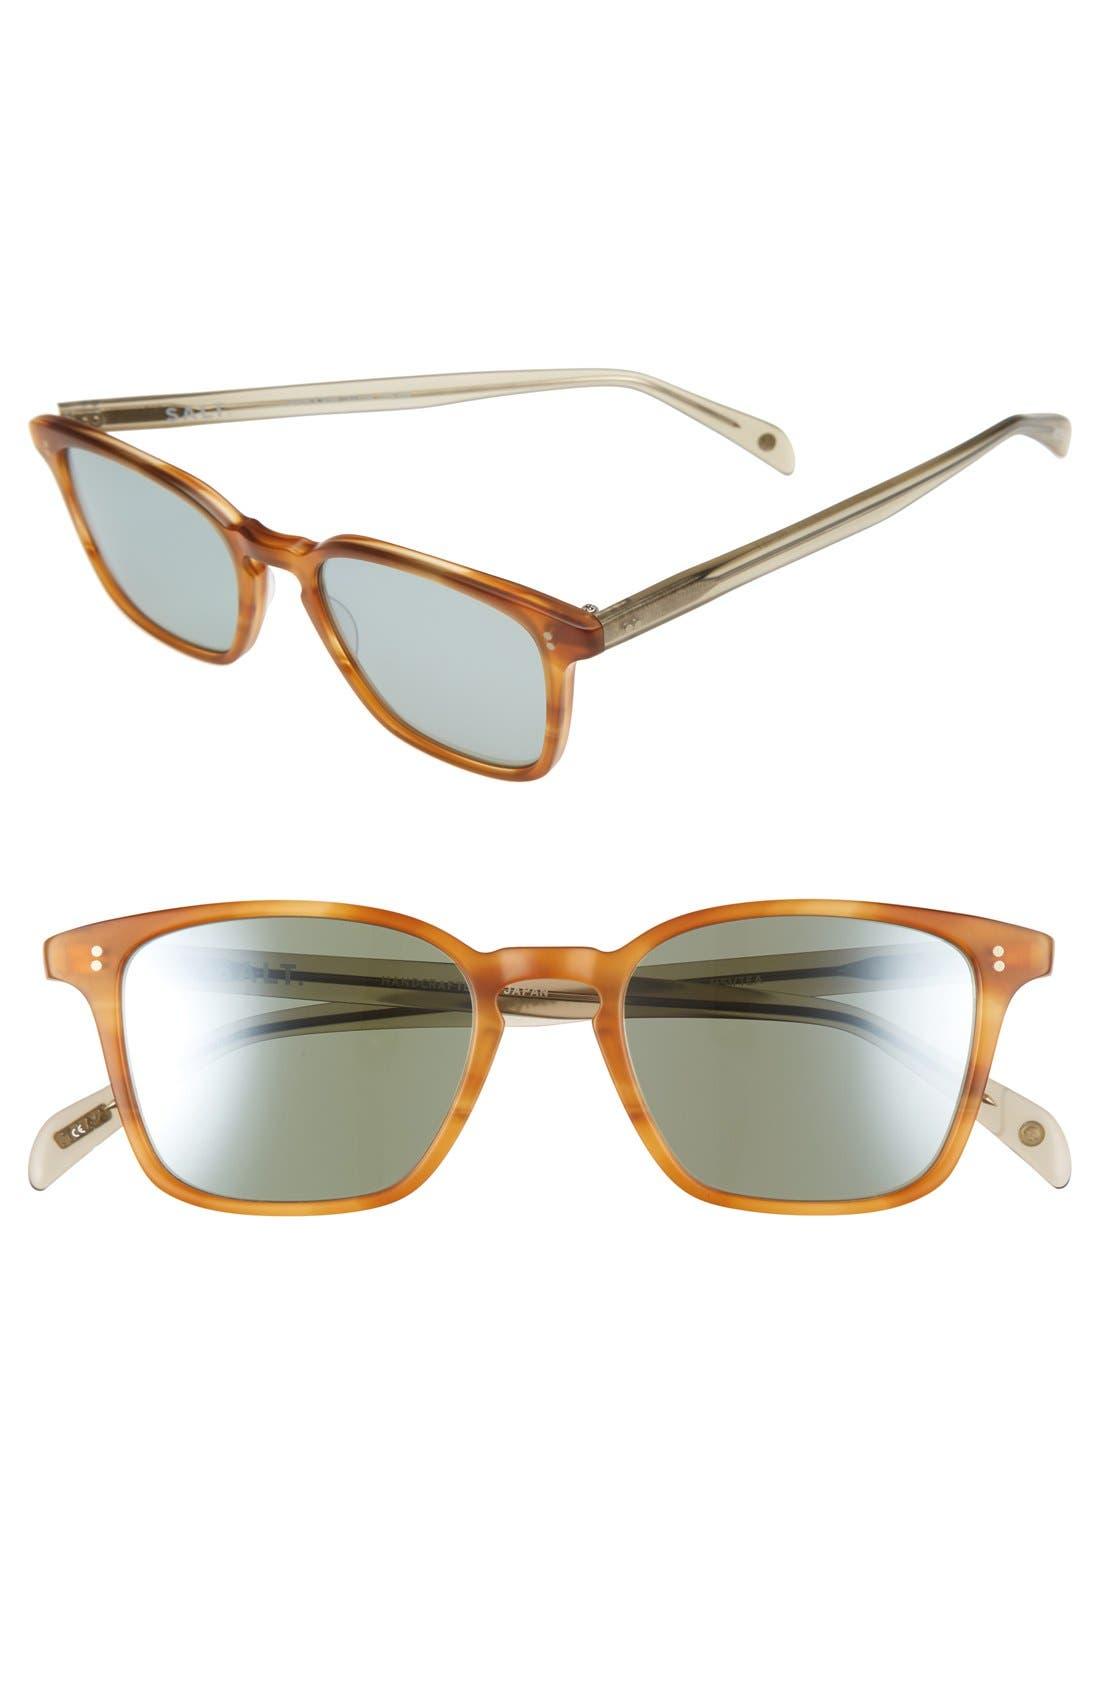 Murdock 51mm Polarized Sunglasses,                         Main,                         color, Matte Sienna / Tea